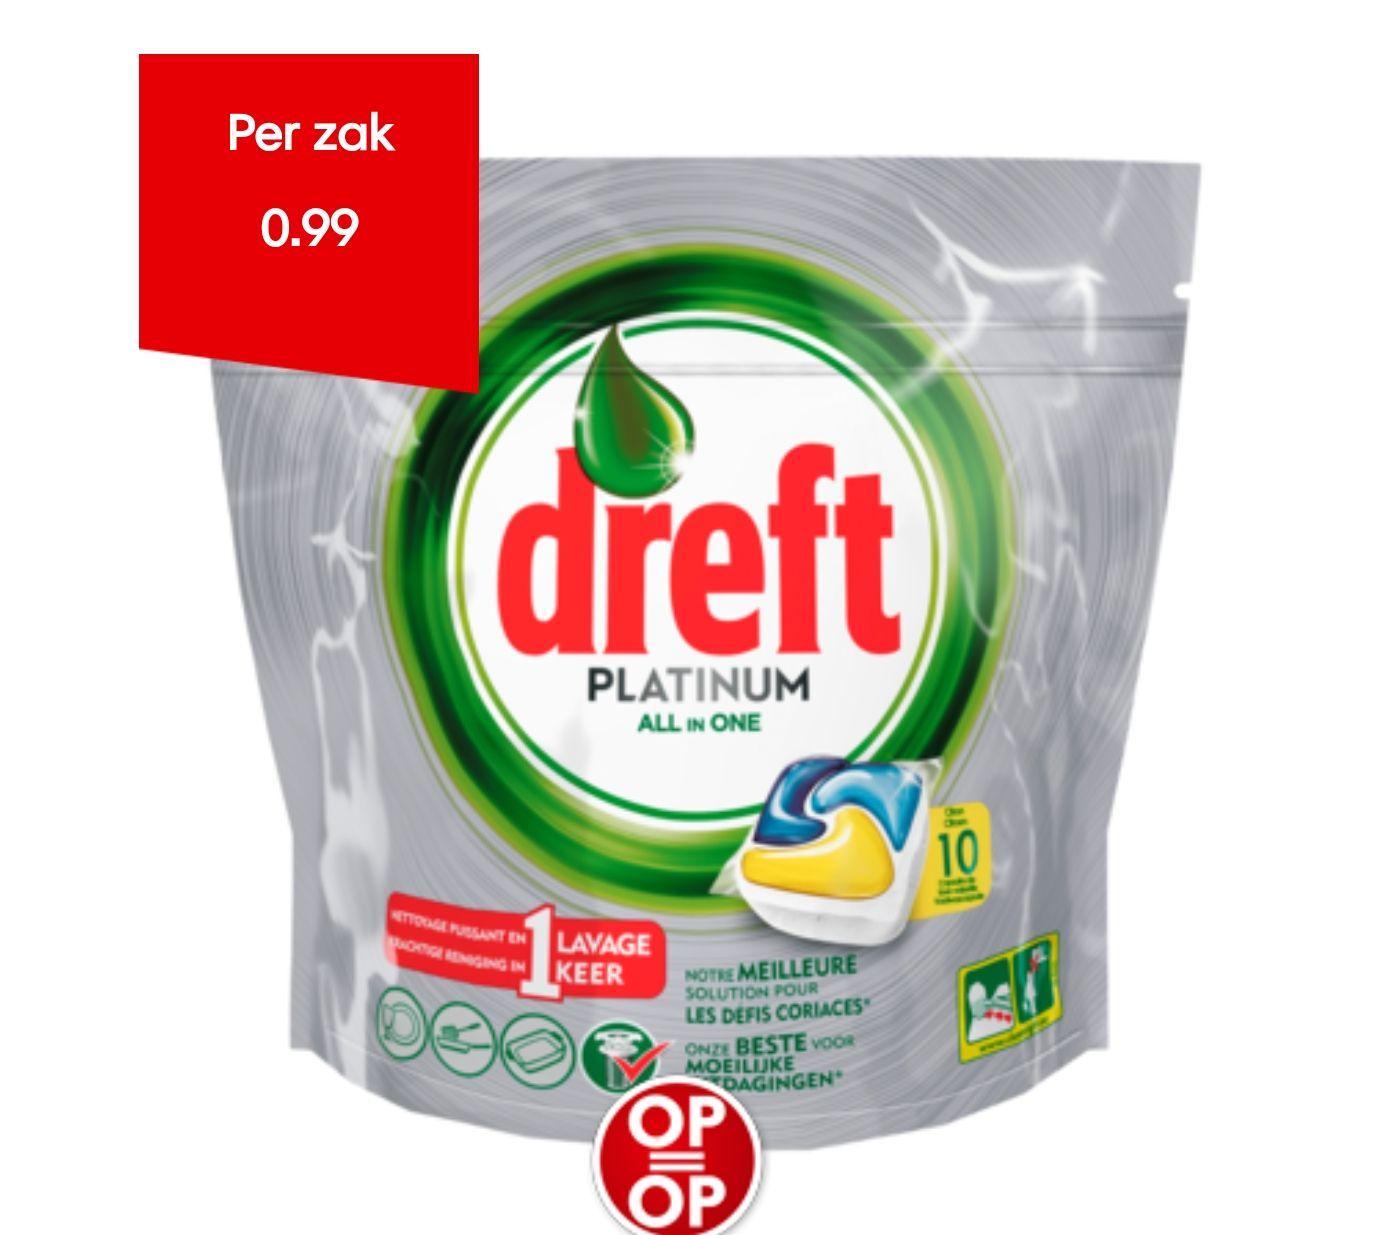 Dreft vaatwastabletten 10 stuks €0,99 @DekaMarkt